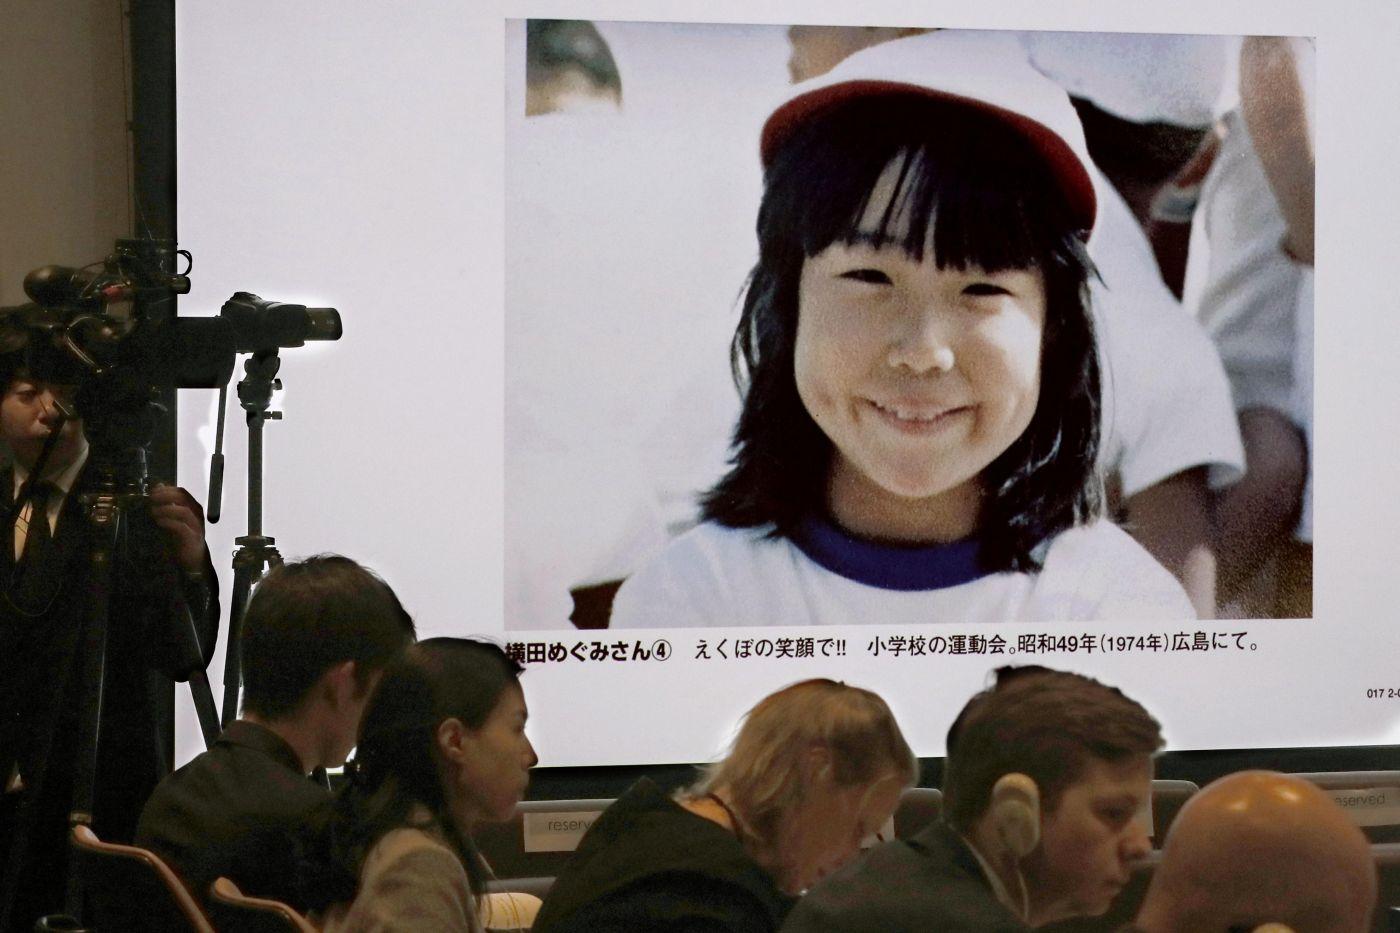 Japan North Korea Abduction Letter to Megumi 008